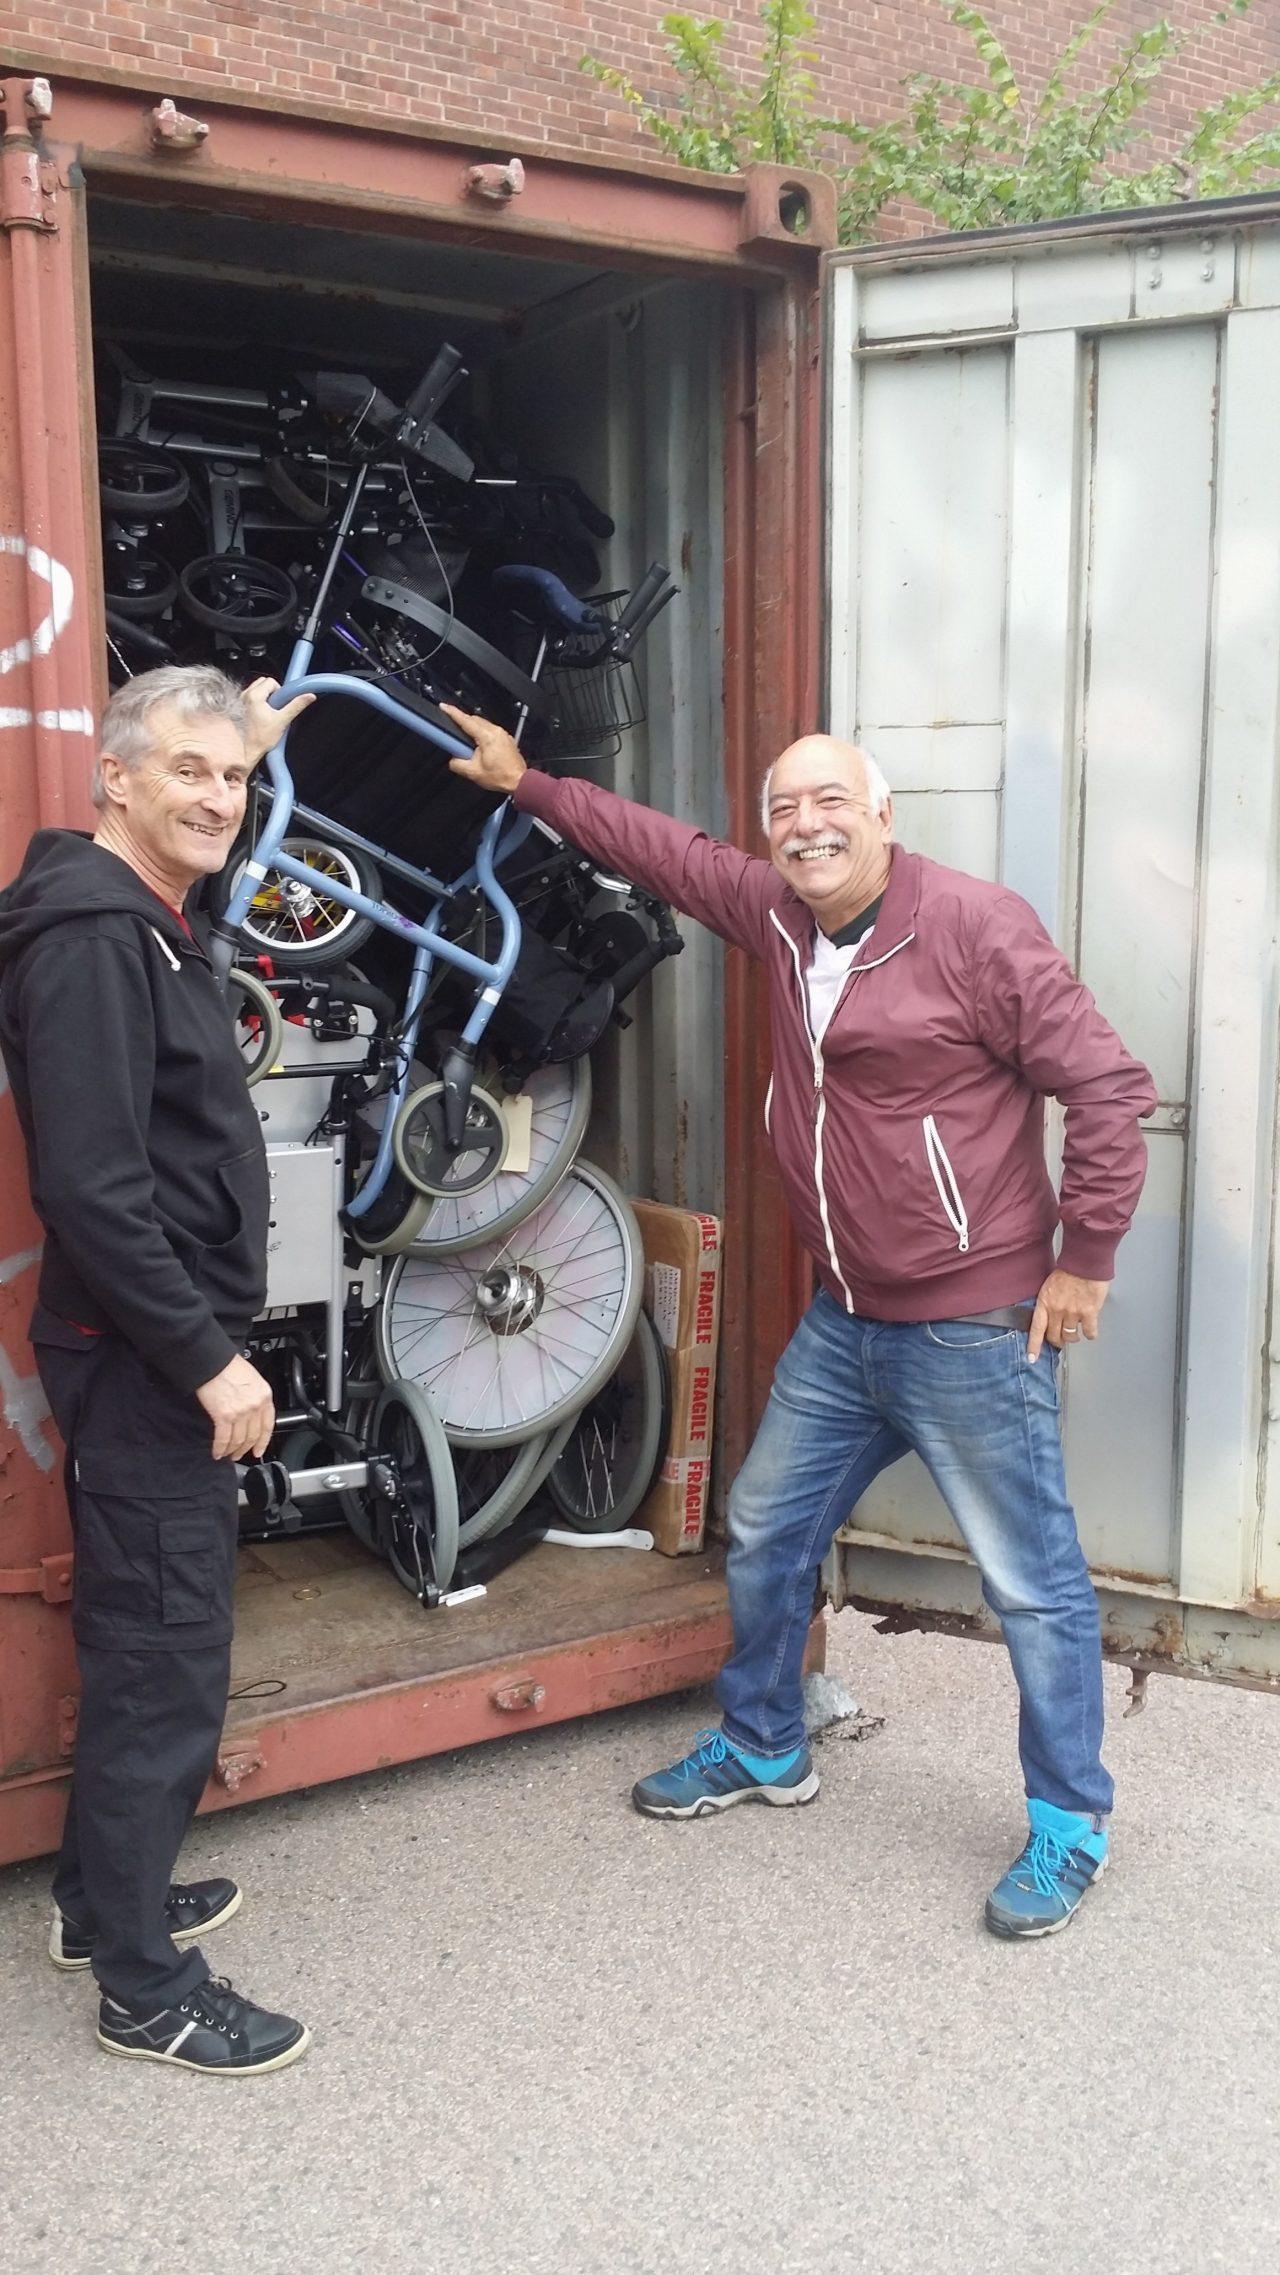 Hugo Klappenbach og Daniel Marrero, to uruguayanere i Sverige som kom og bidro